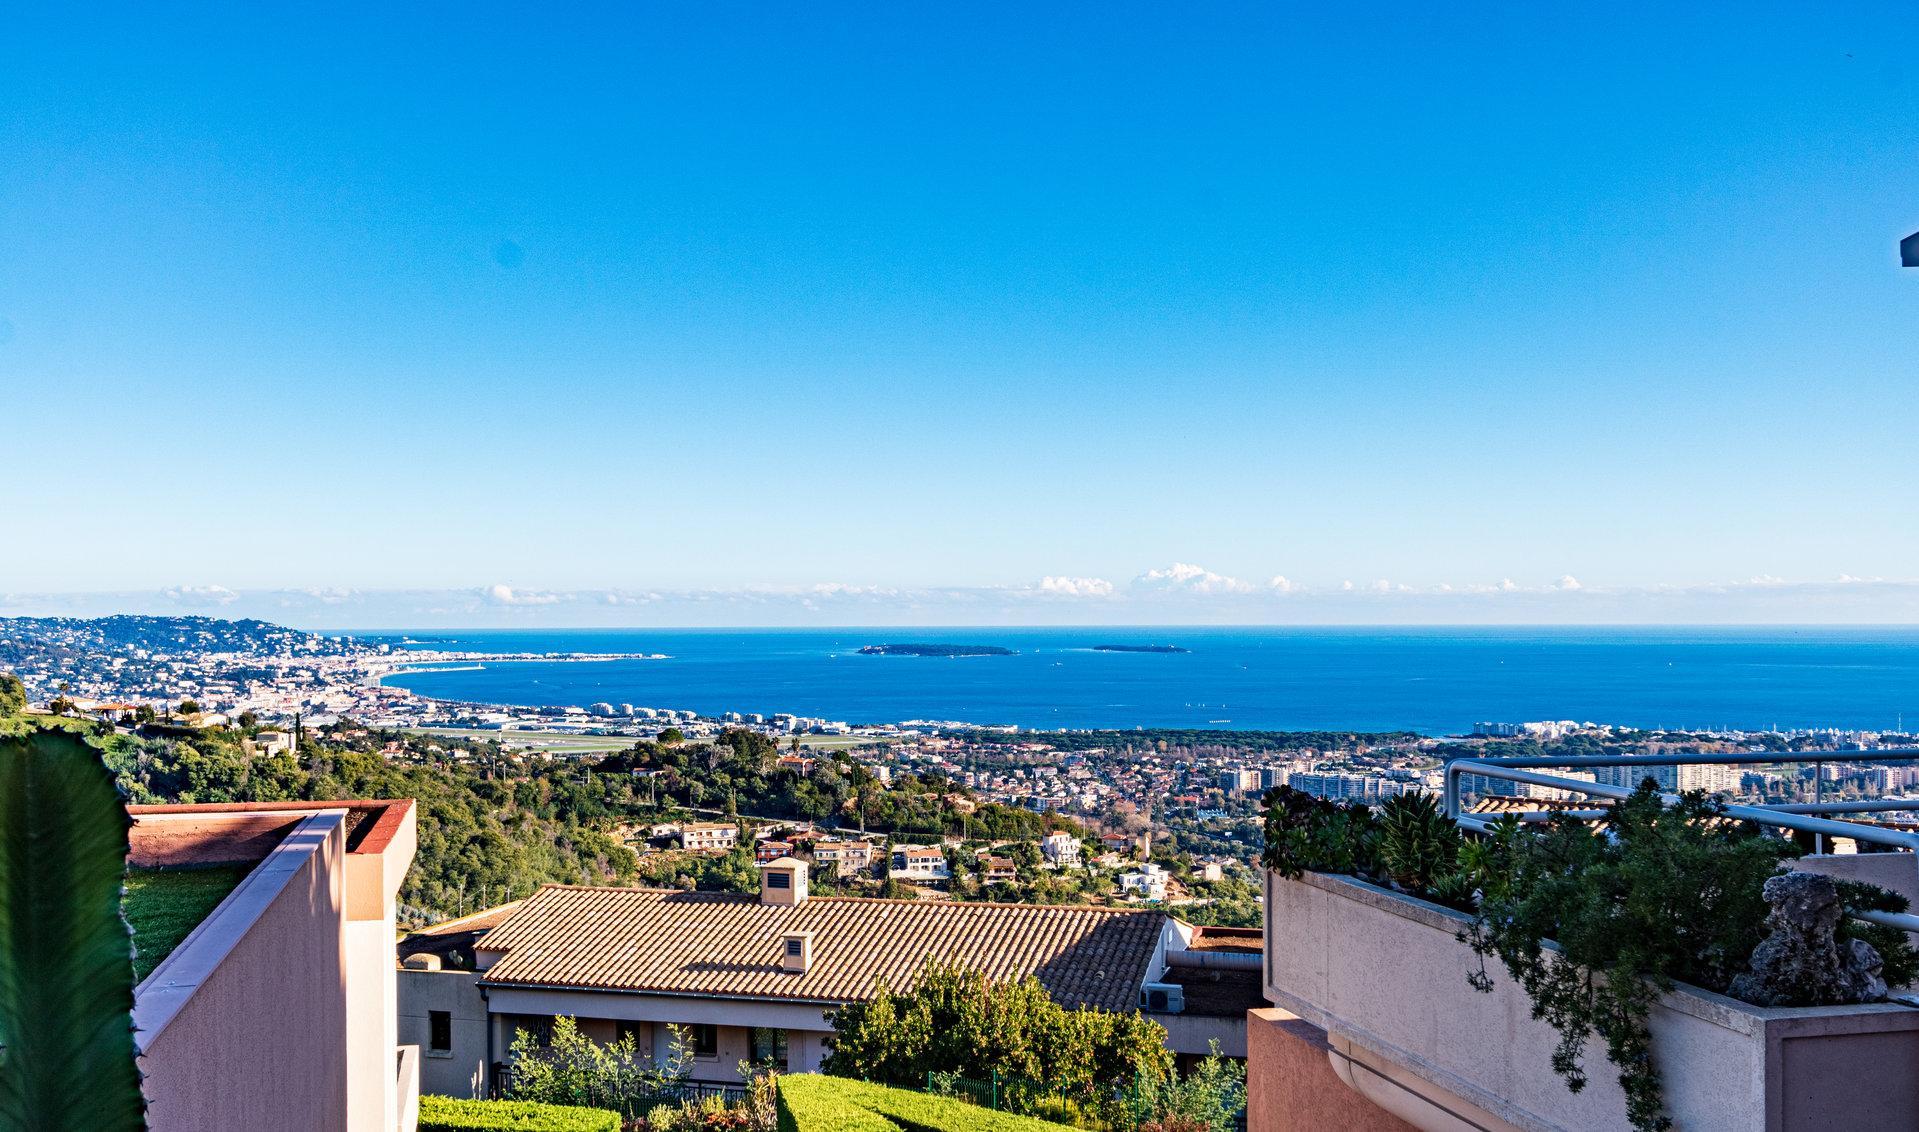 3-bed apartment, luxury domain, pool, tennis, sea view in Mandelieu